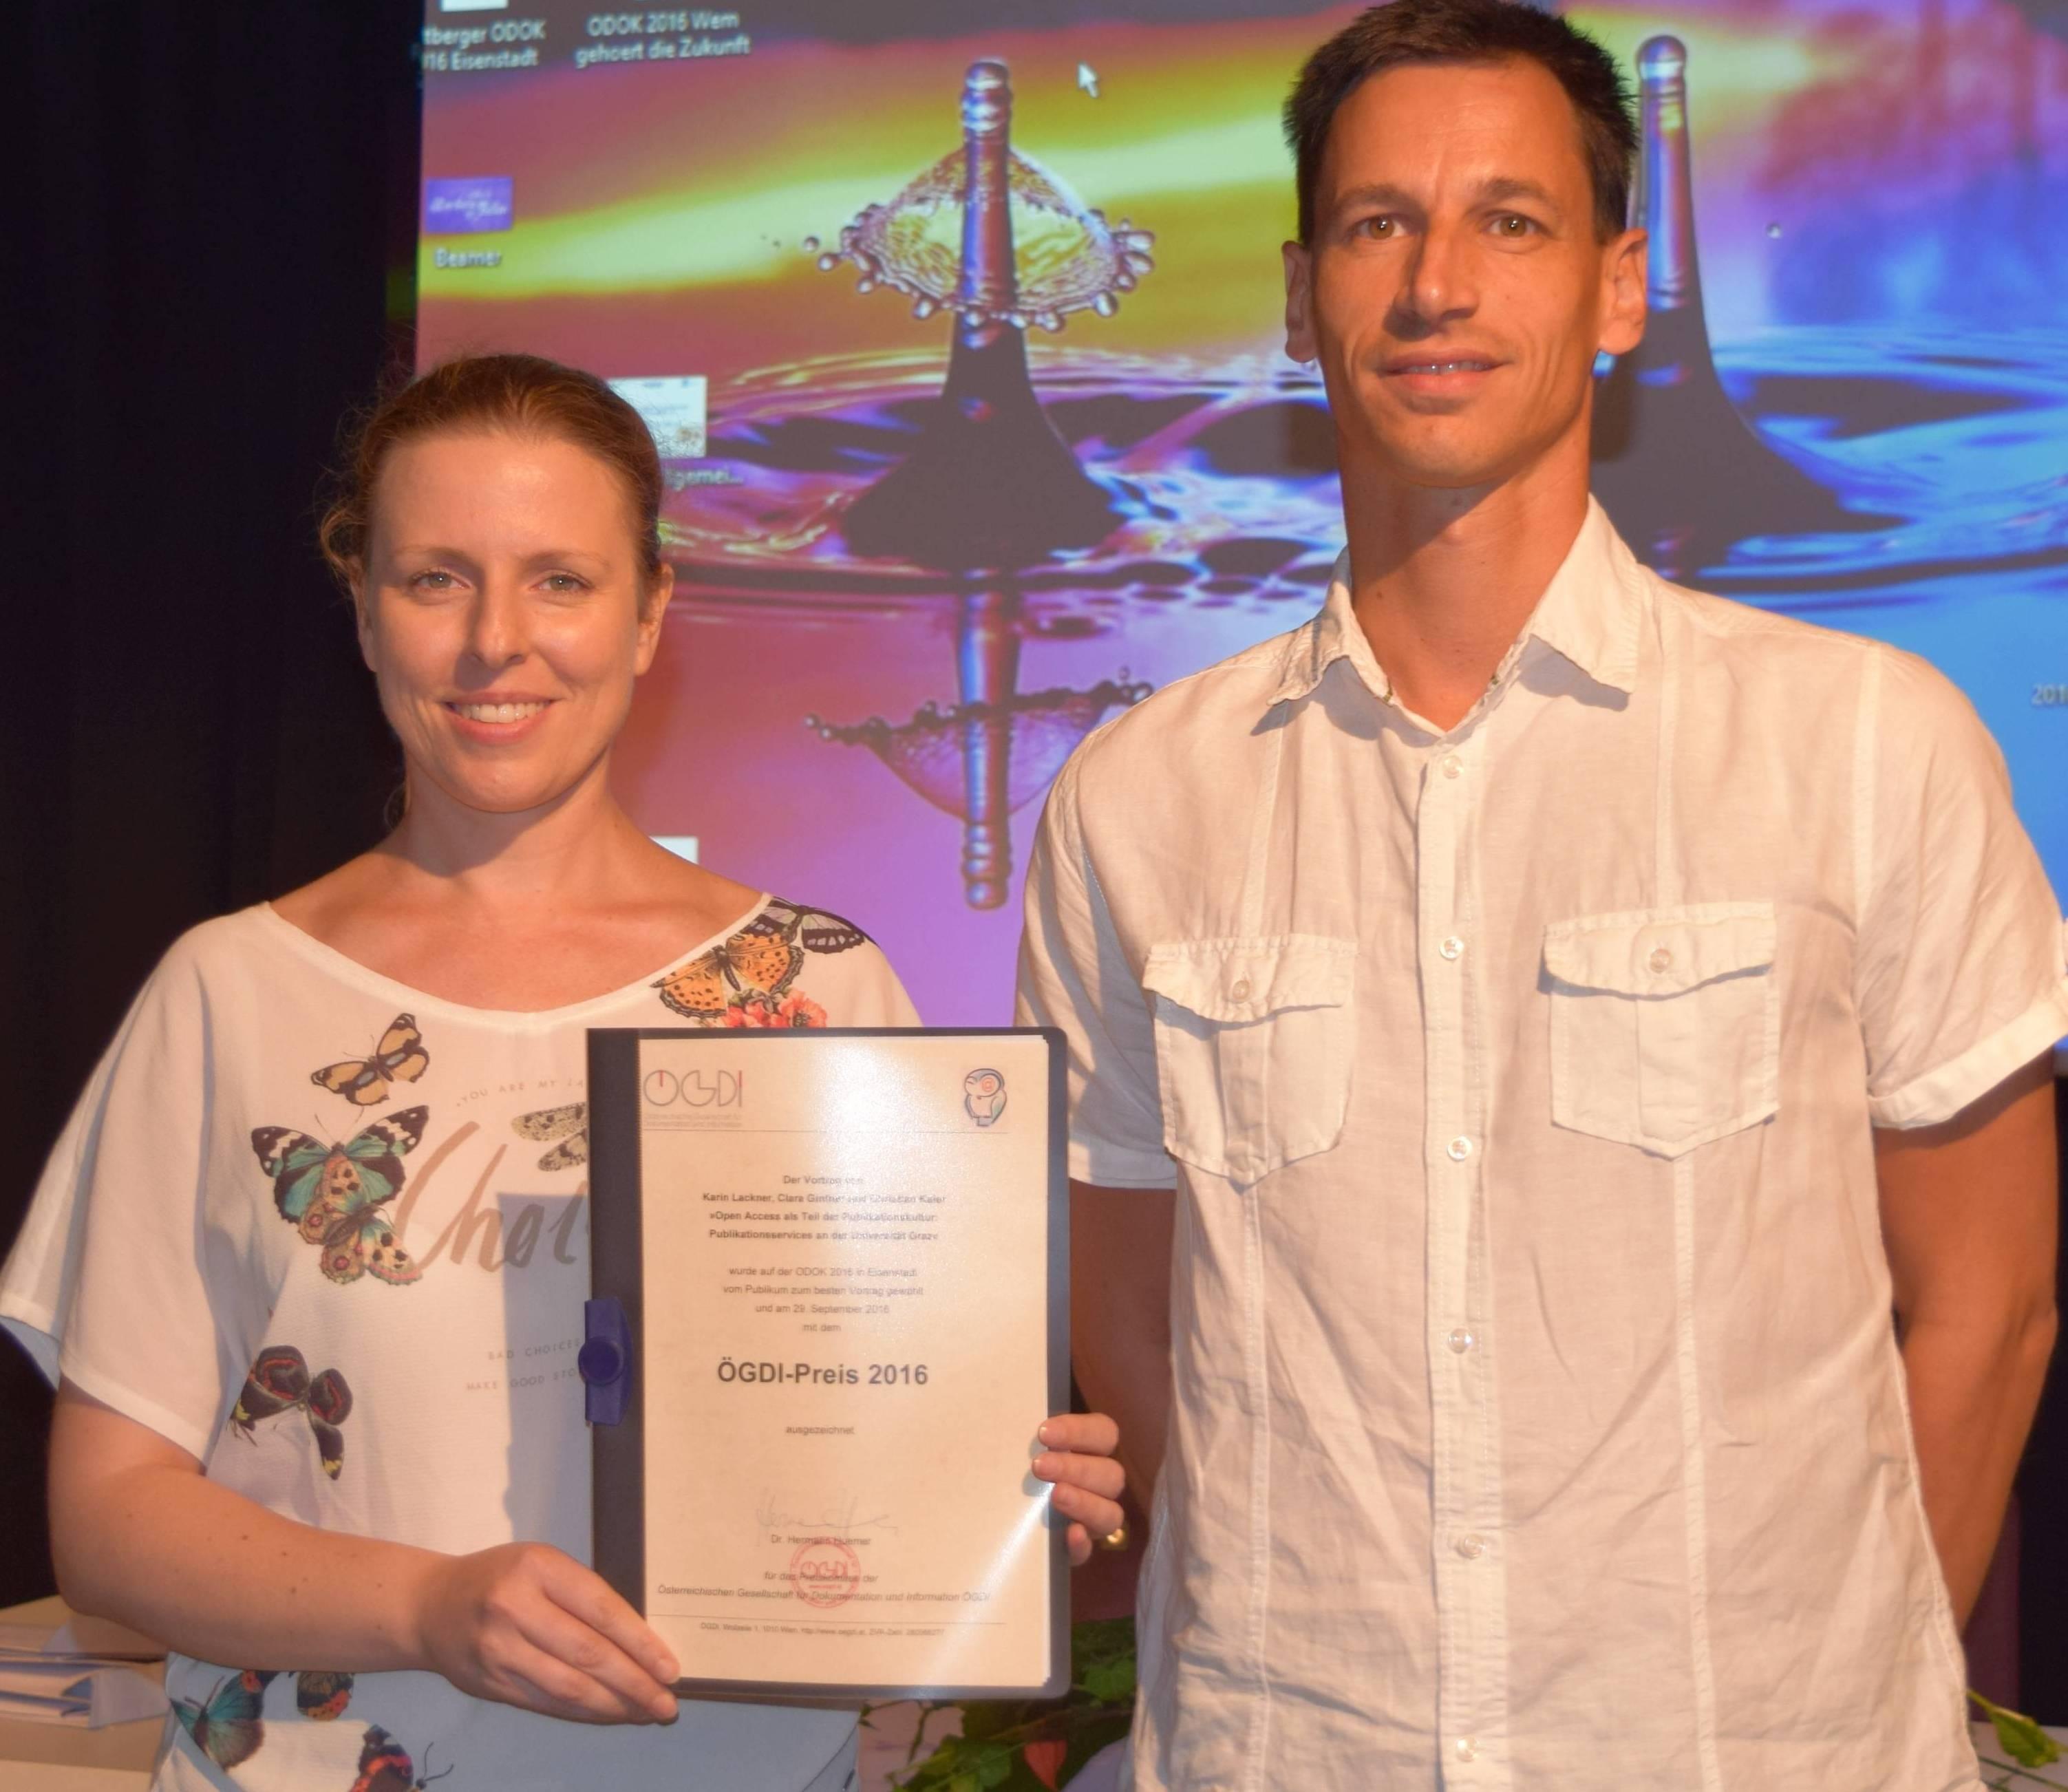 Karin Lackner und Christian Kaier (UB Graz) nach der Preisverleihung